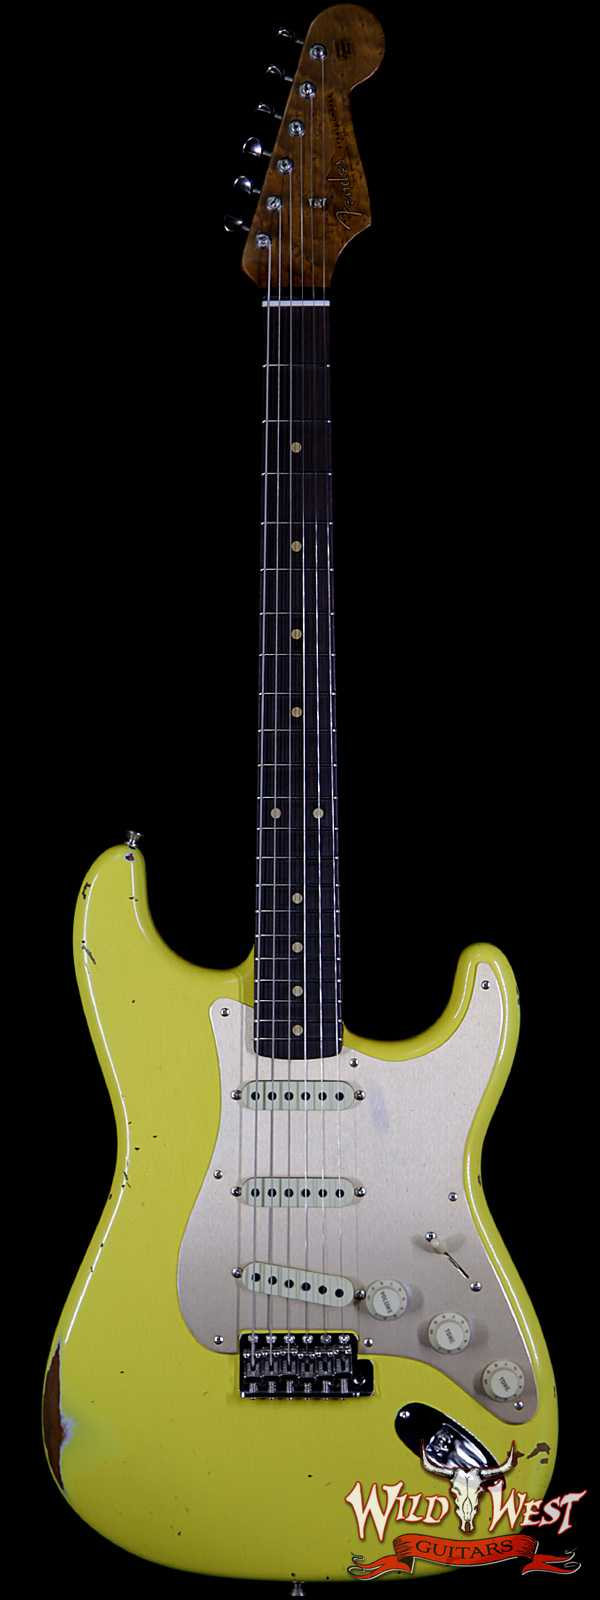 Fender Custom Shop 1960 Roasted Stratocaster Relic Birdseye Neck Rosewood Fingerboard Graffiti Yellow